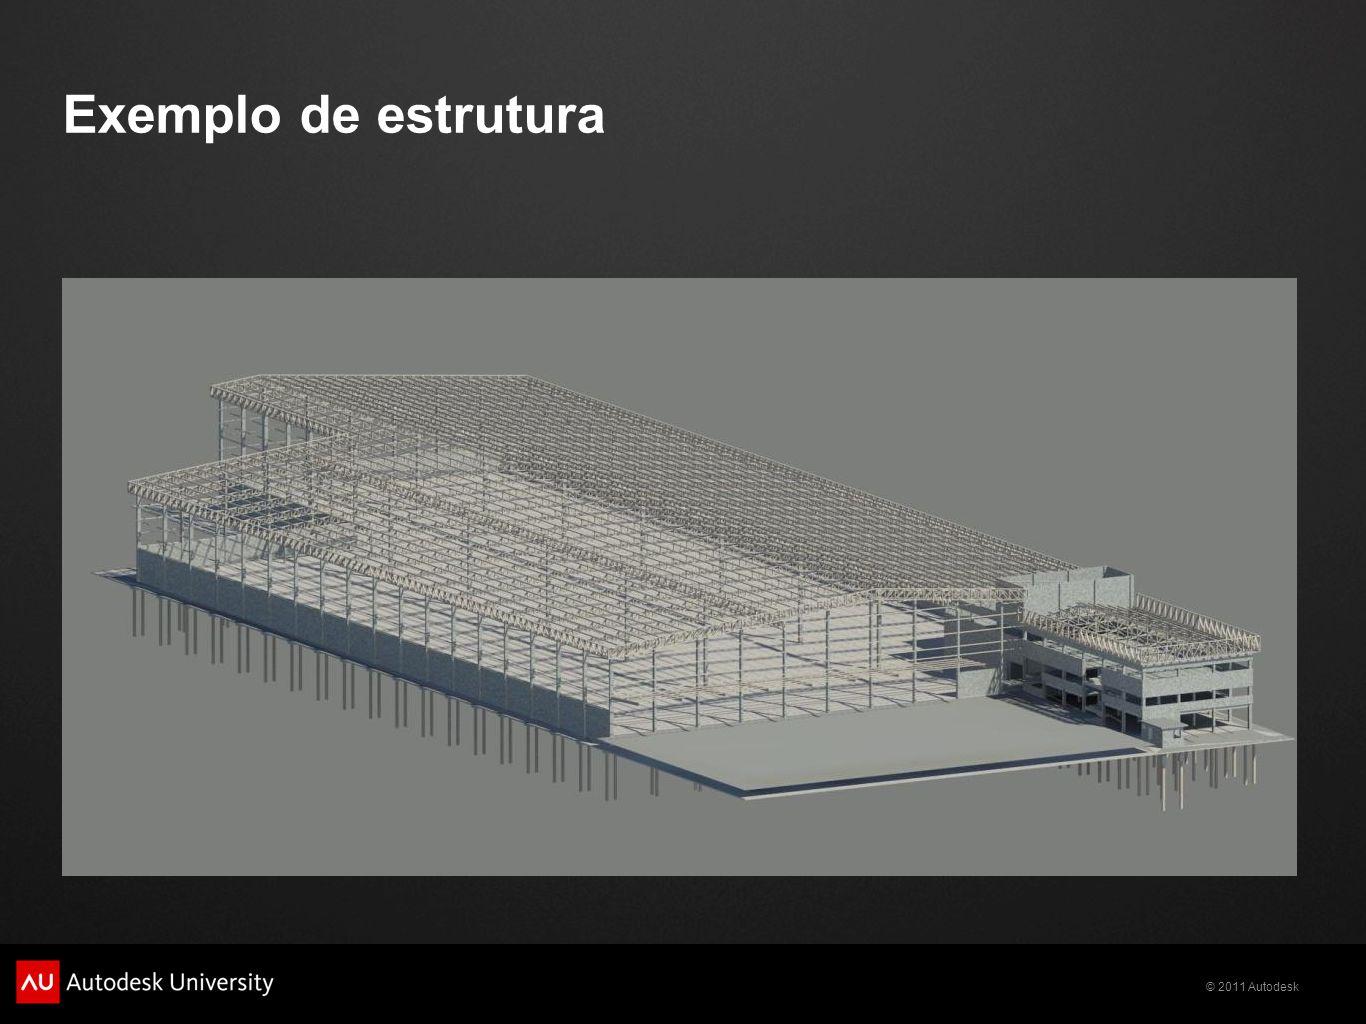 Exemplo de estrutura